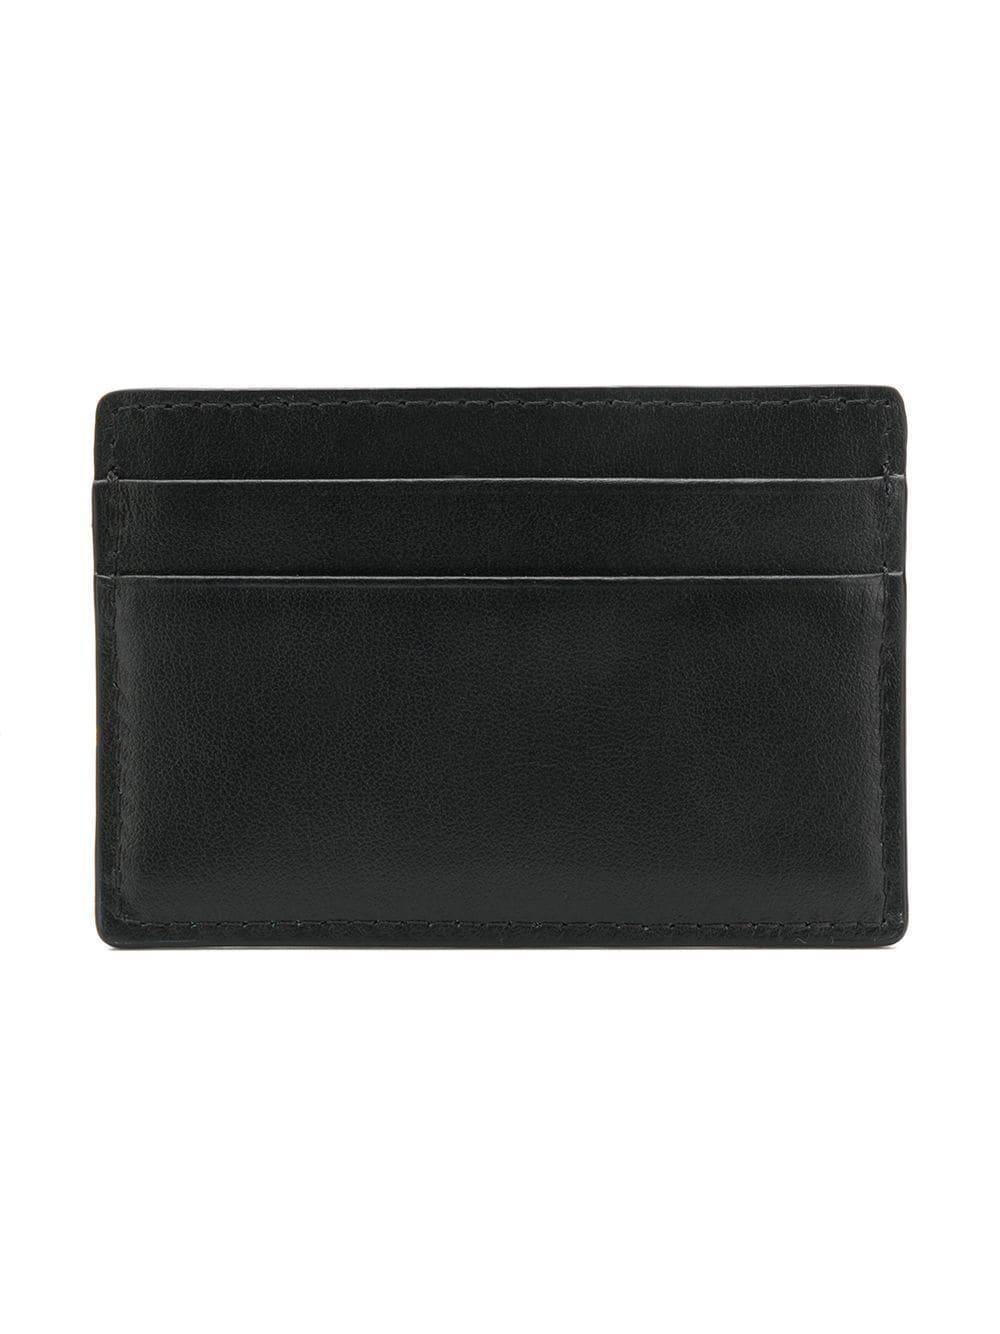 ... classic 35b05 63594 Versace - Black Mini Medusa Head Cardholder for Men  - Lyst. 609b2284de